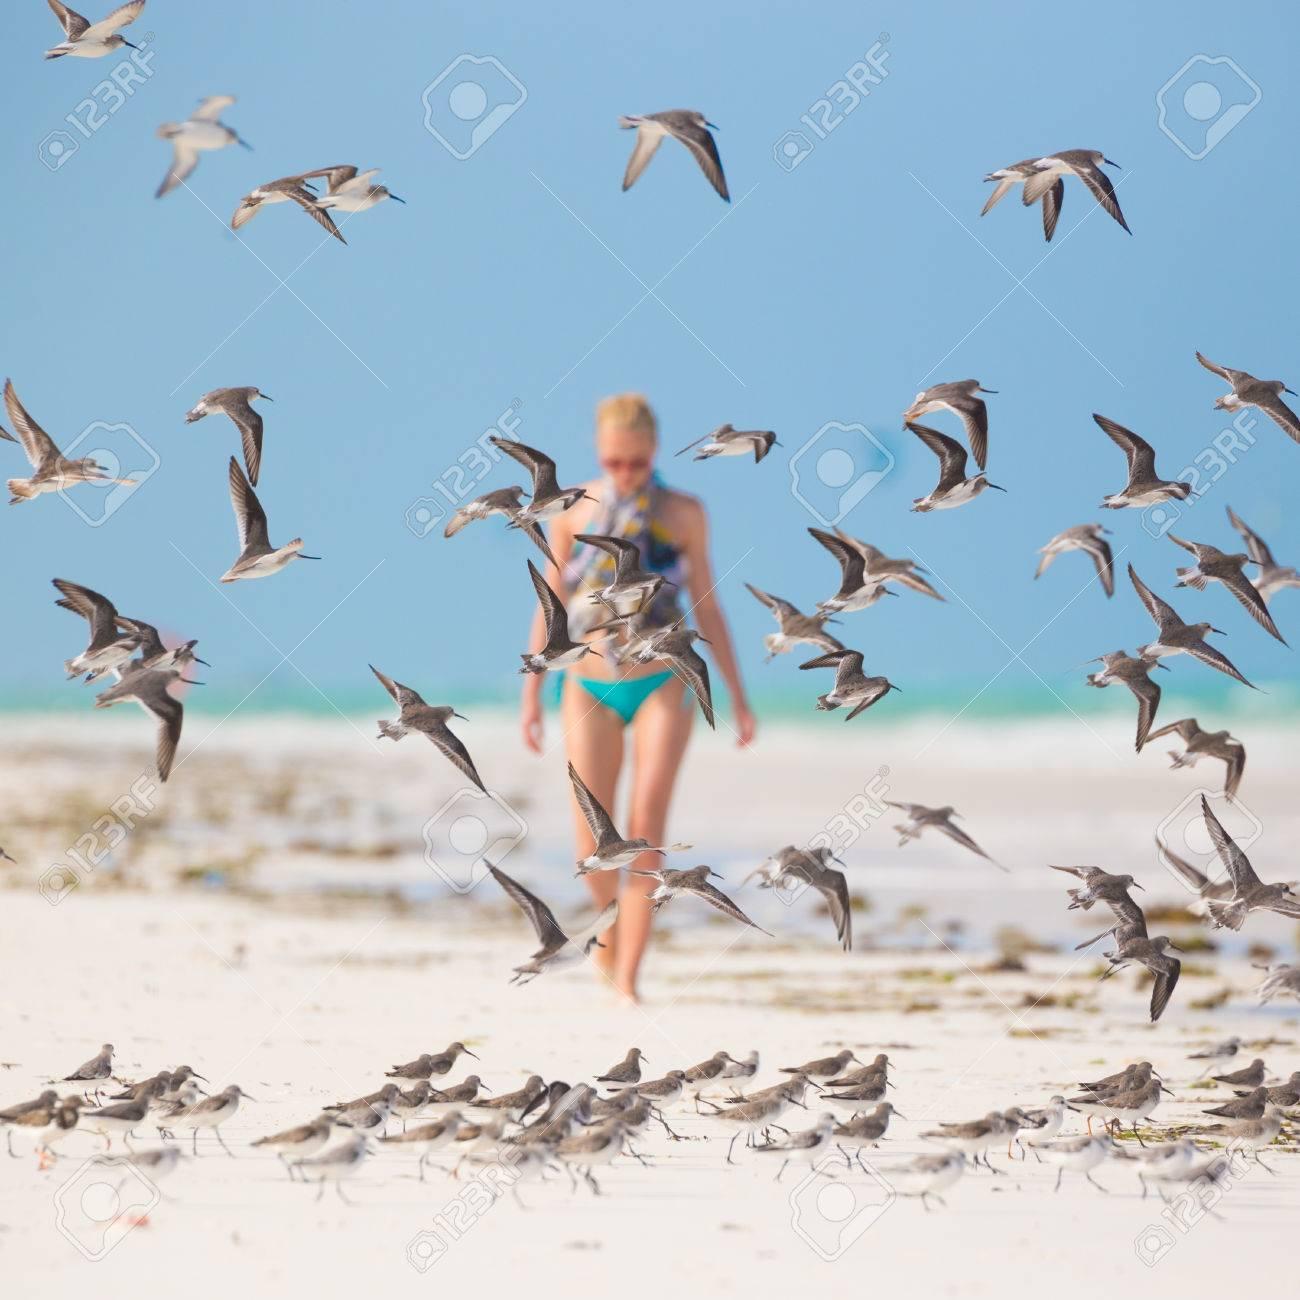 woman walking on the beach among flock of birds beautiful